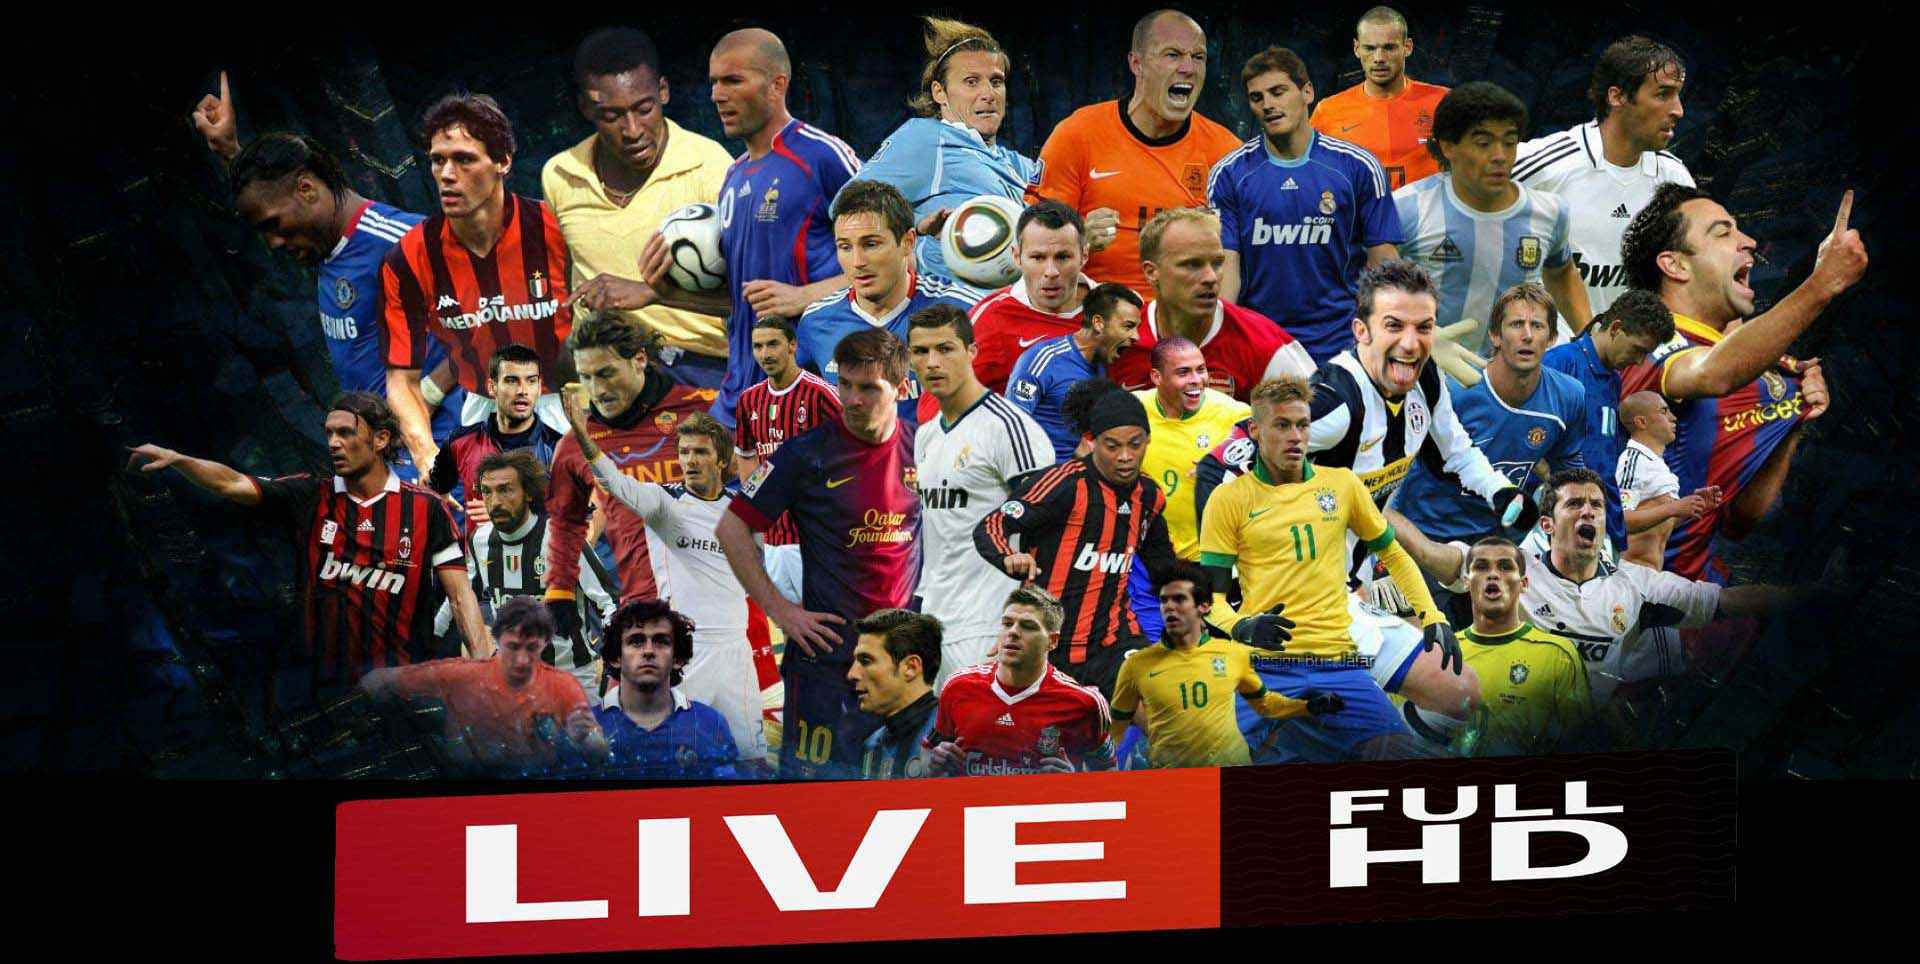 Monaco Vs Juventus semifinal live